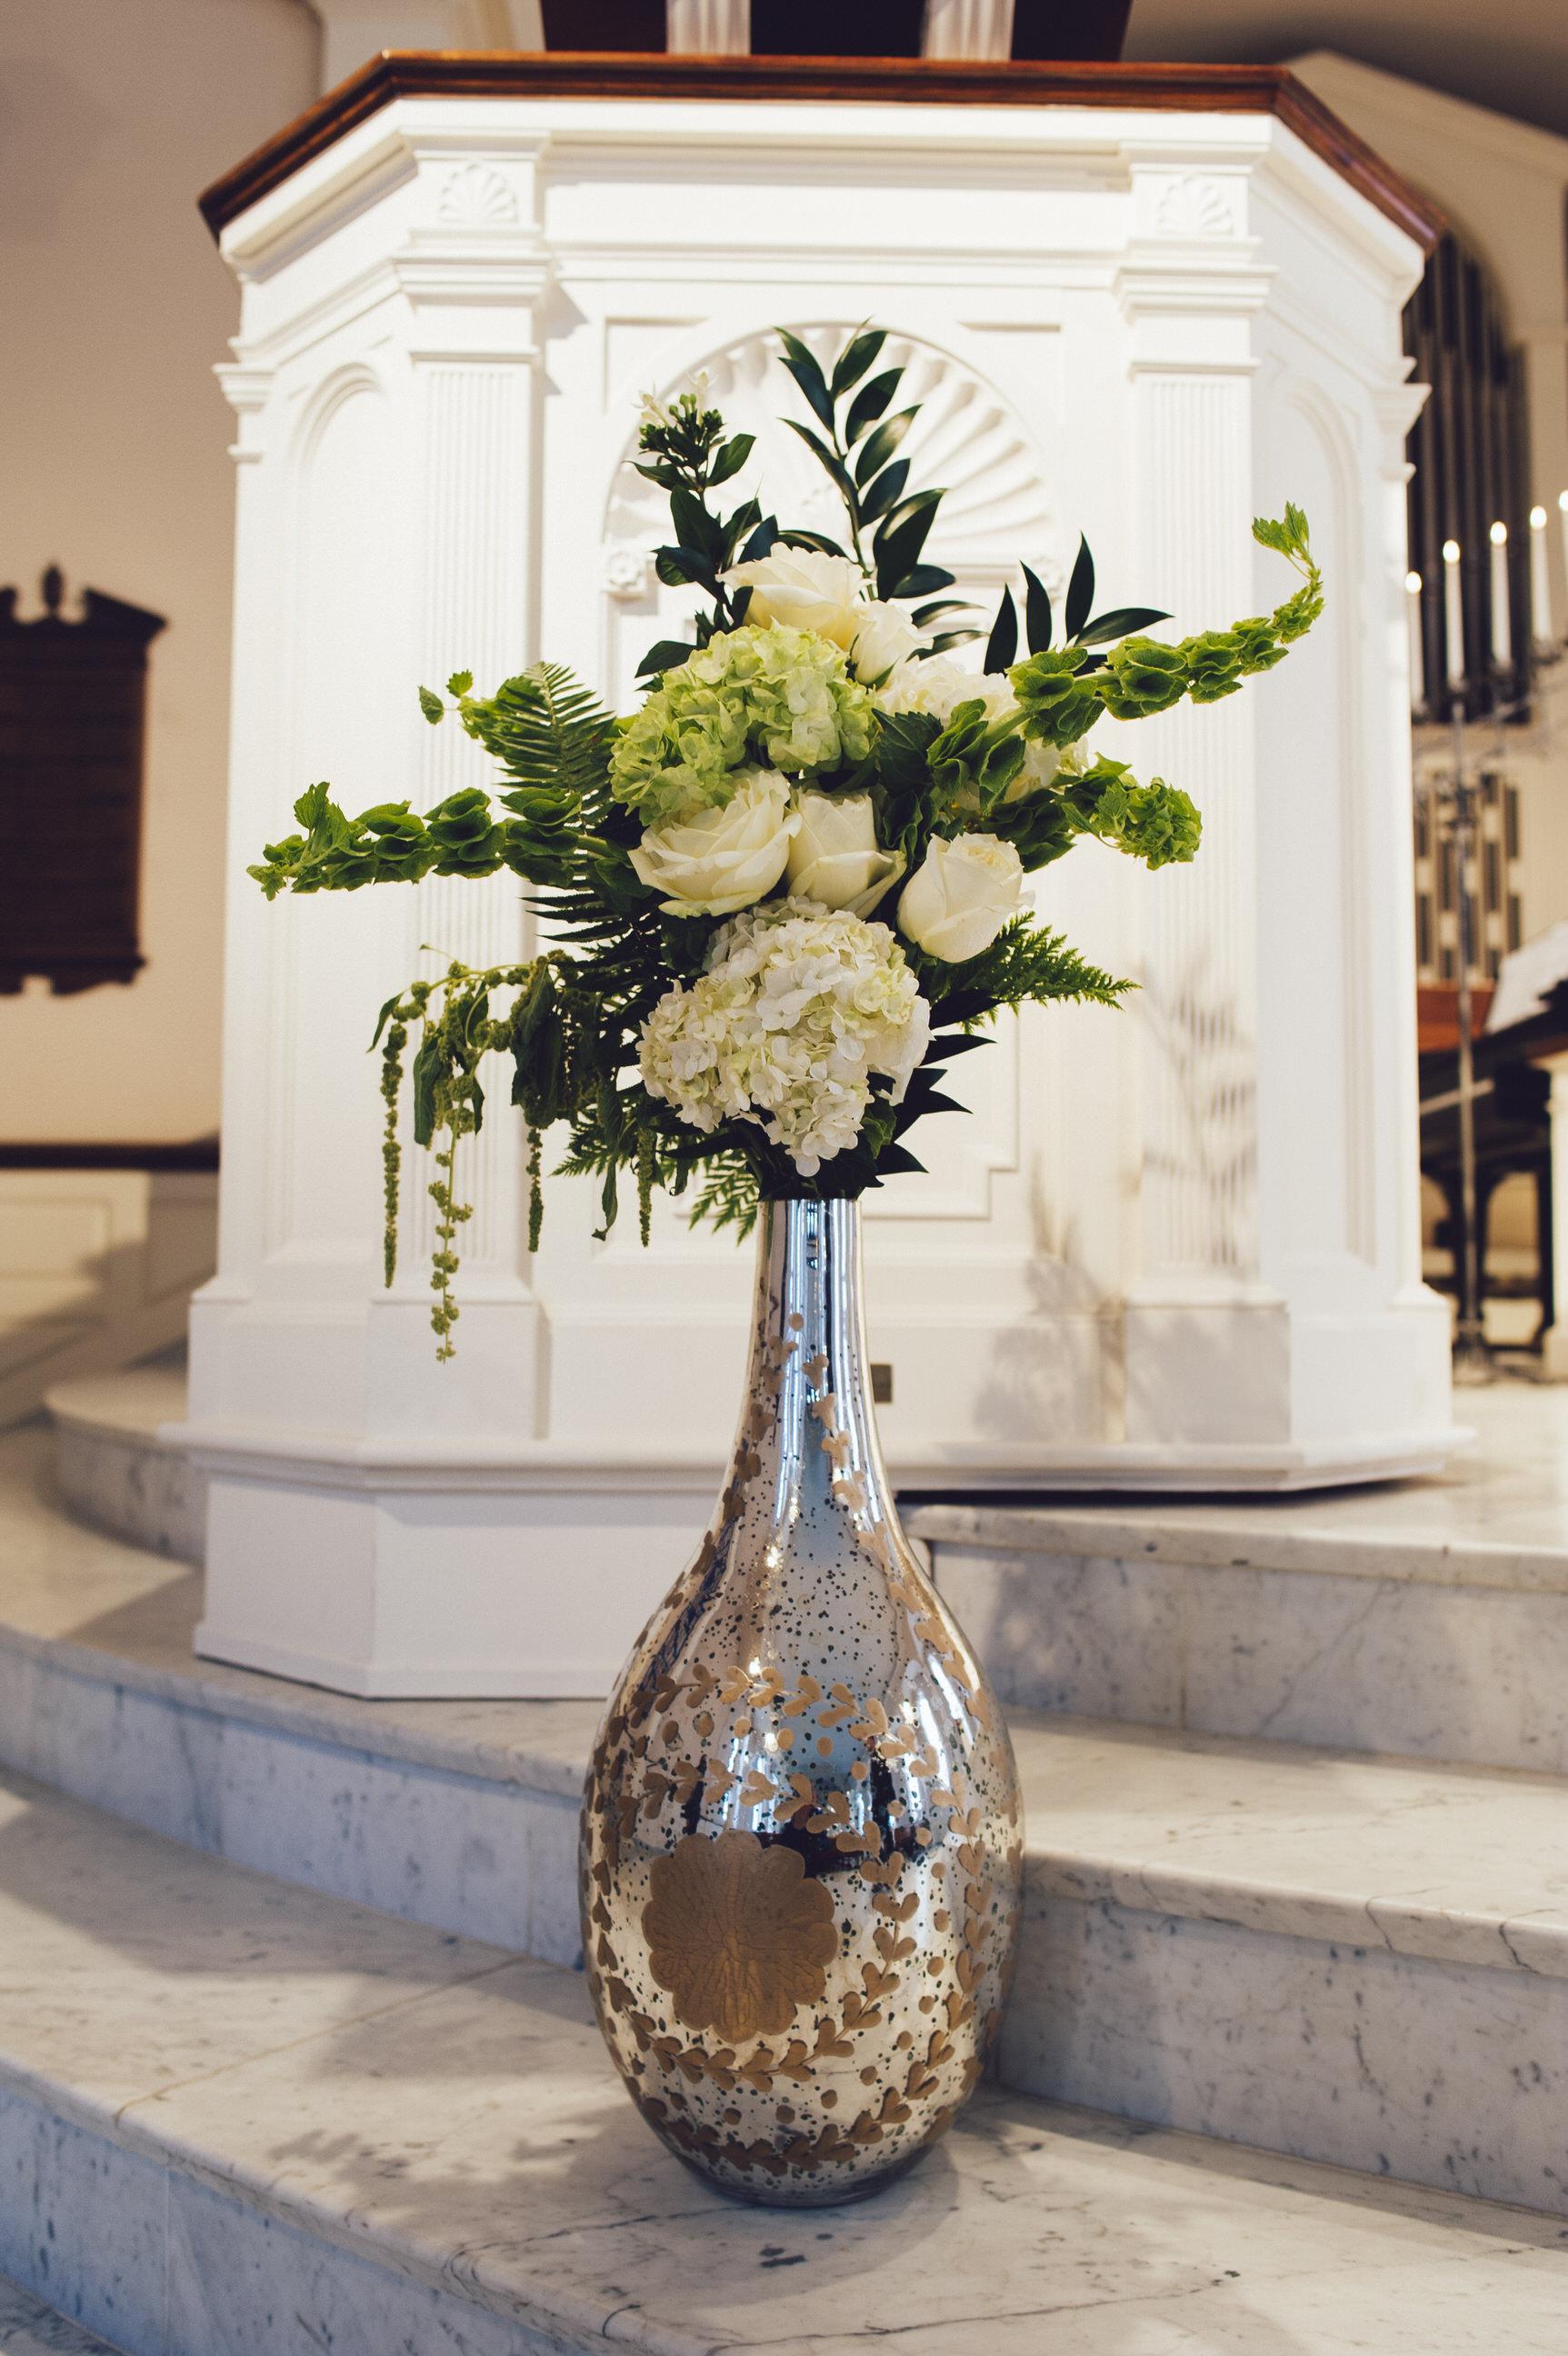 02 Mercury Glass White Flowers Greenery Ceremony Decor Wilmington Wedding Florist.jpg